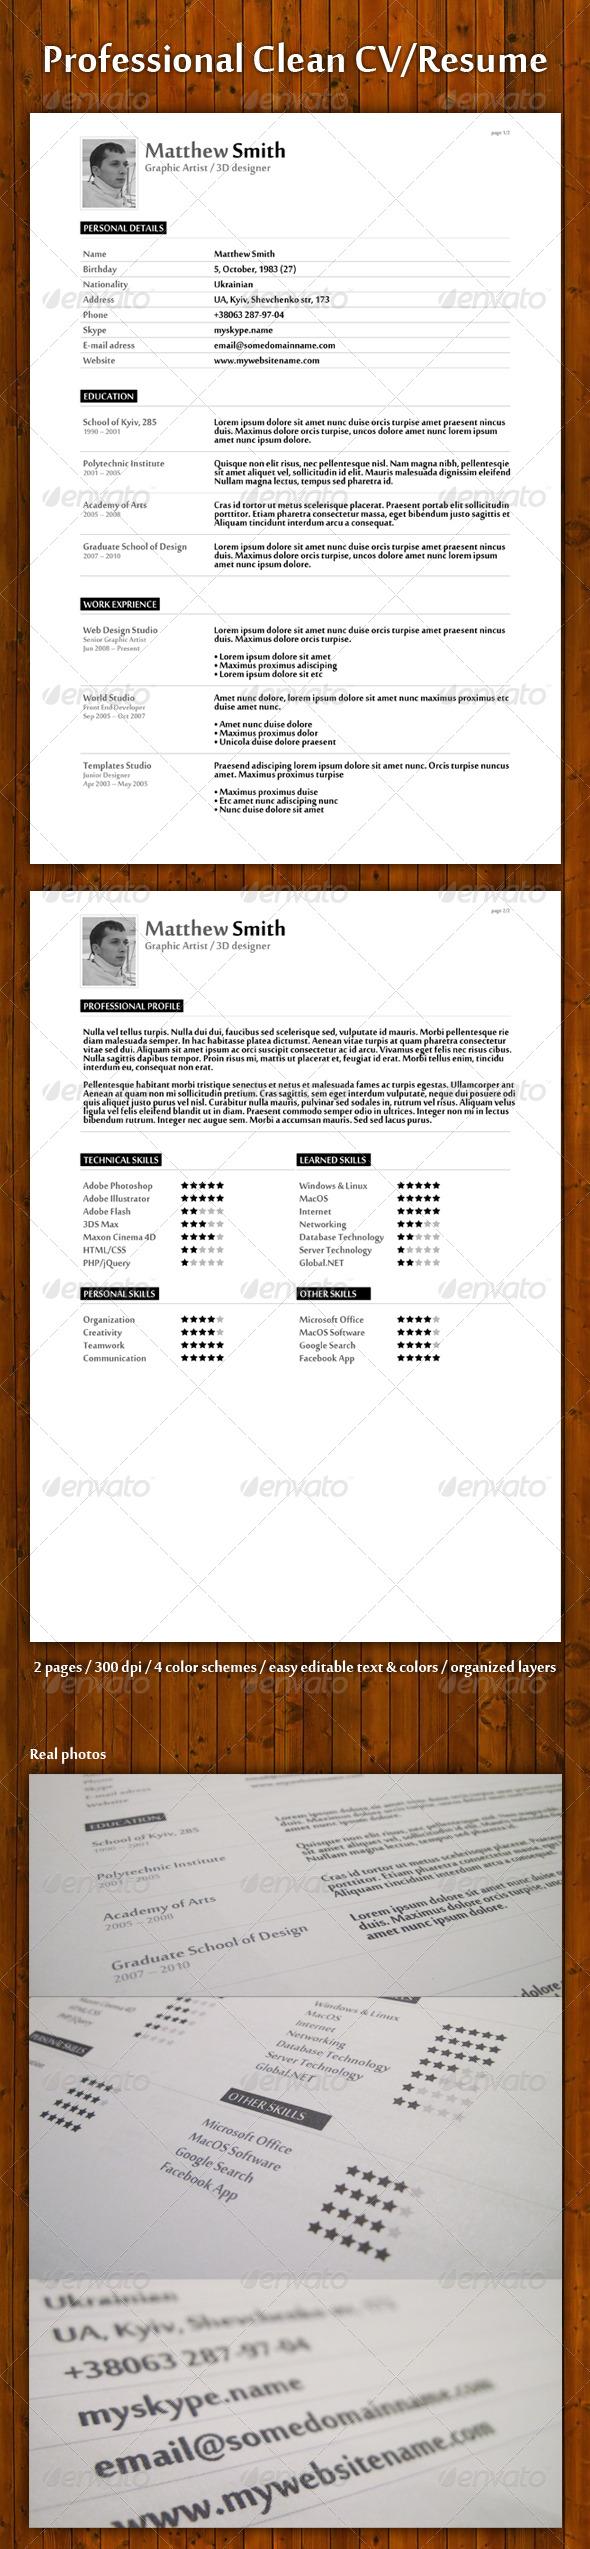 GraphicRiver Professional Clean Resume CV 133999